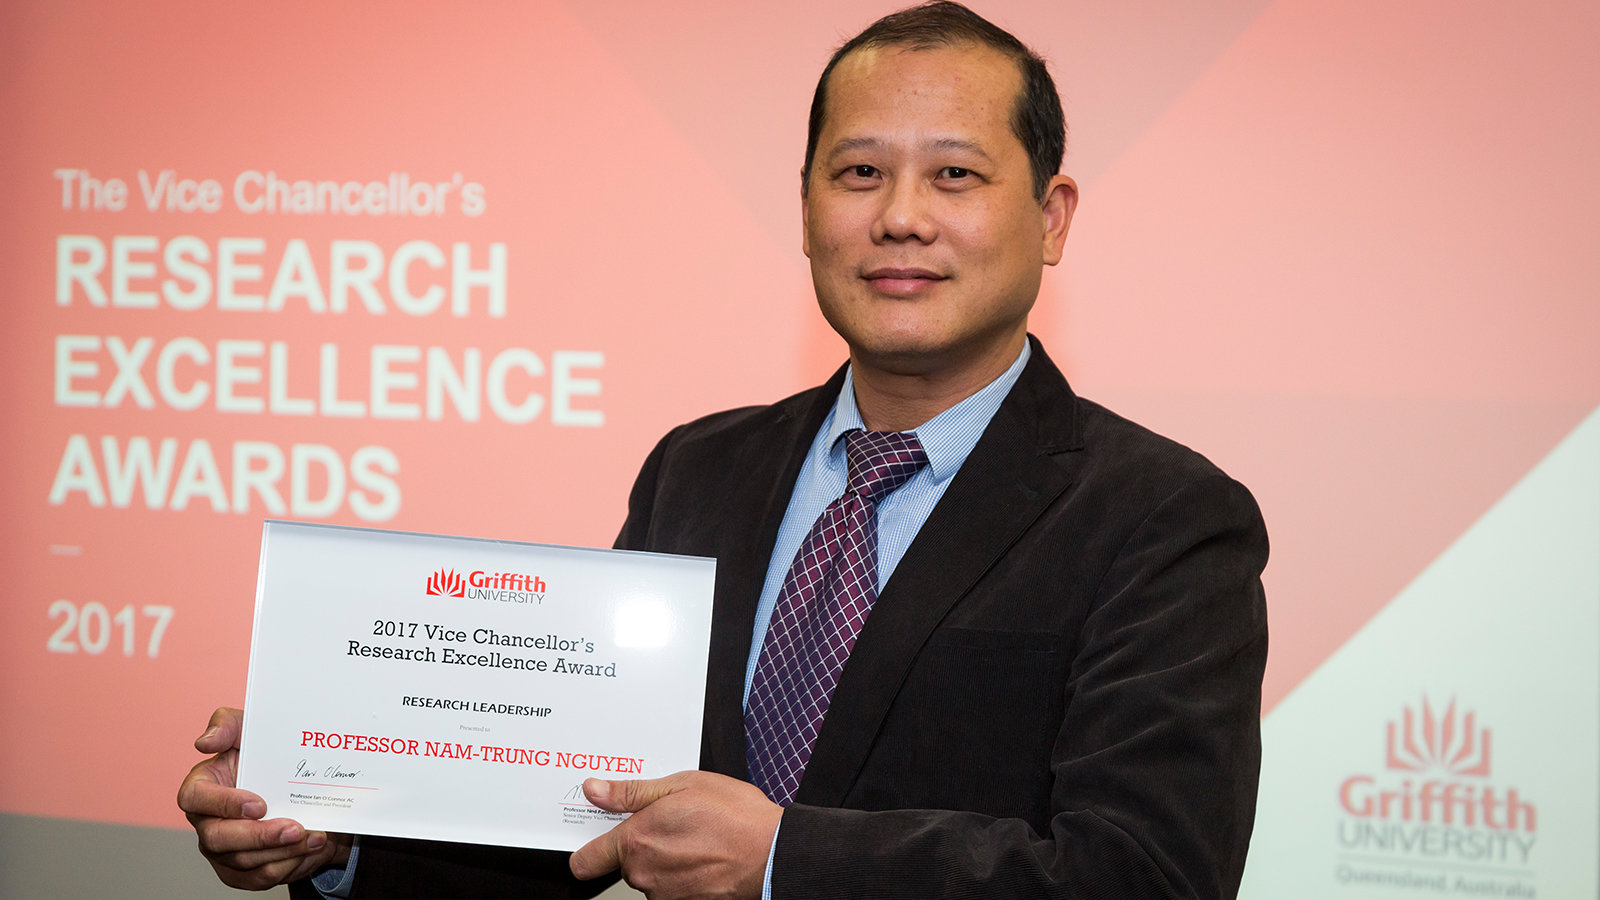 Prof. Nam-Trung Nguyen